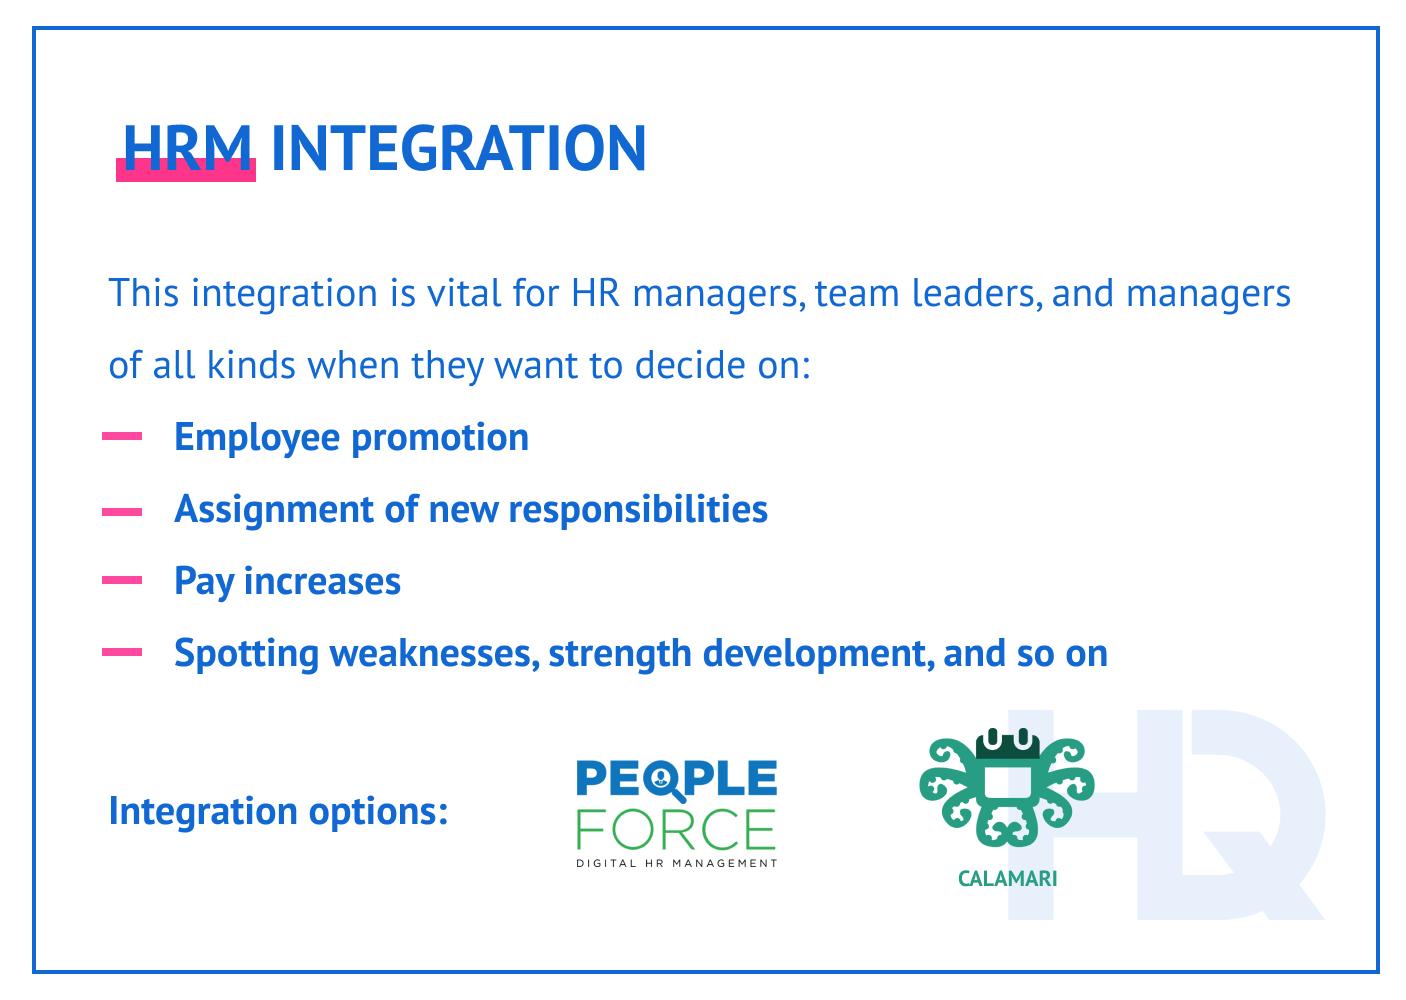 HRM integration